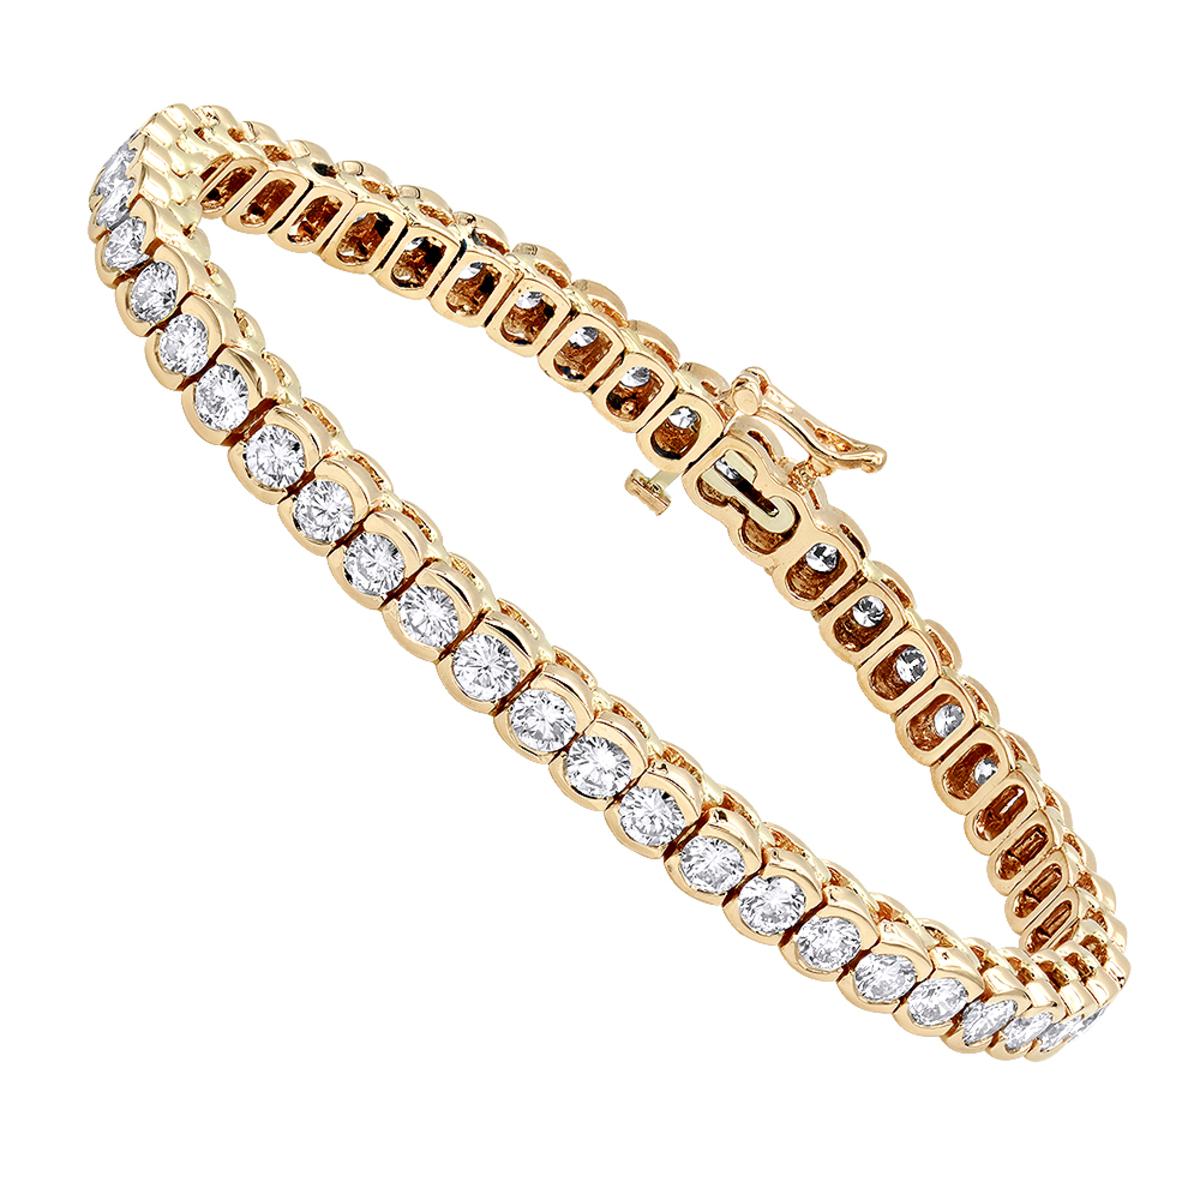 14K Gold Round Diamond Tennis Bracelet Half Bezel Setting 8ct